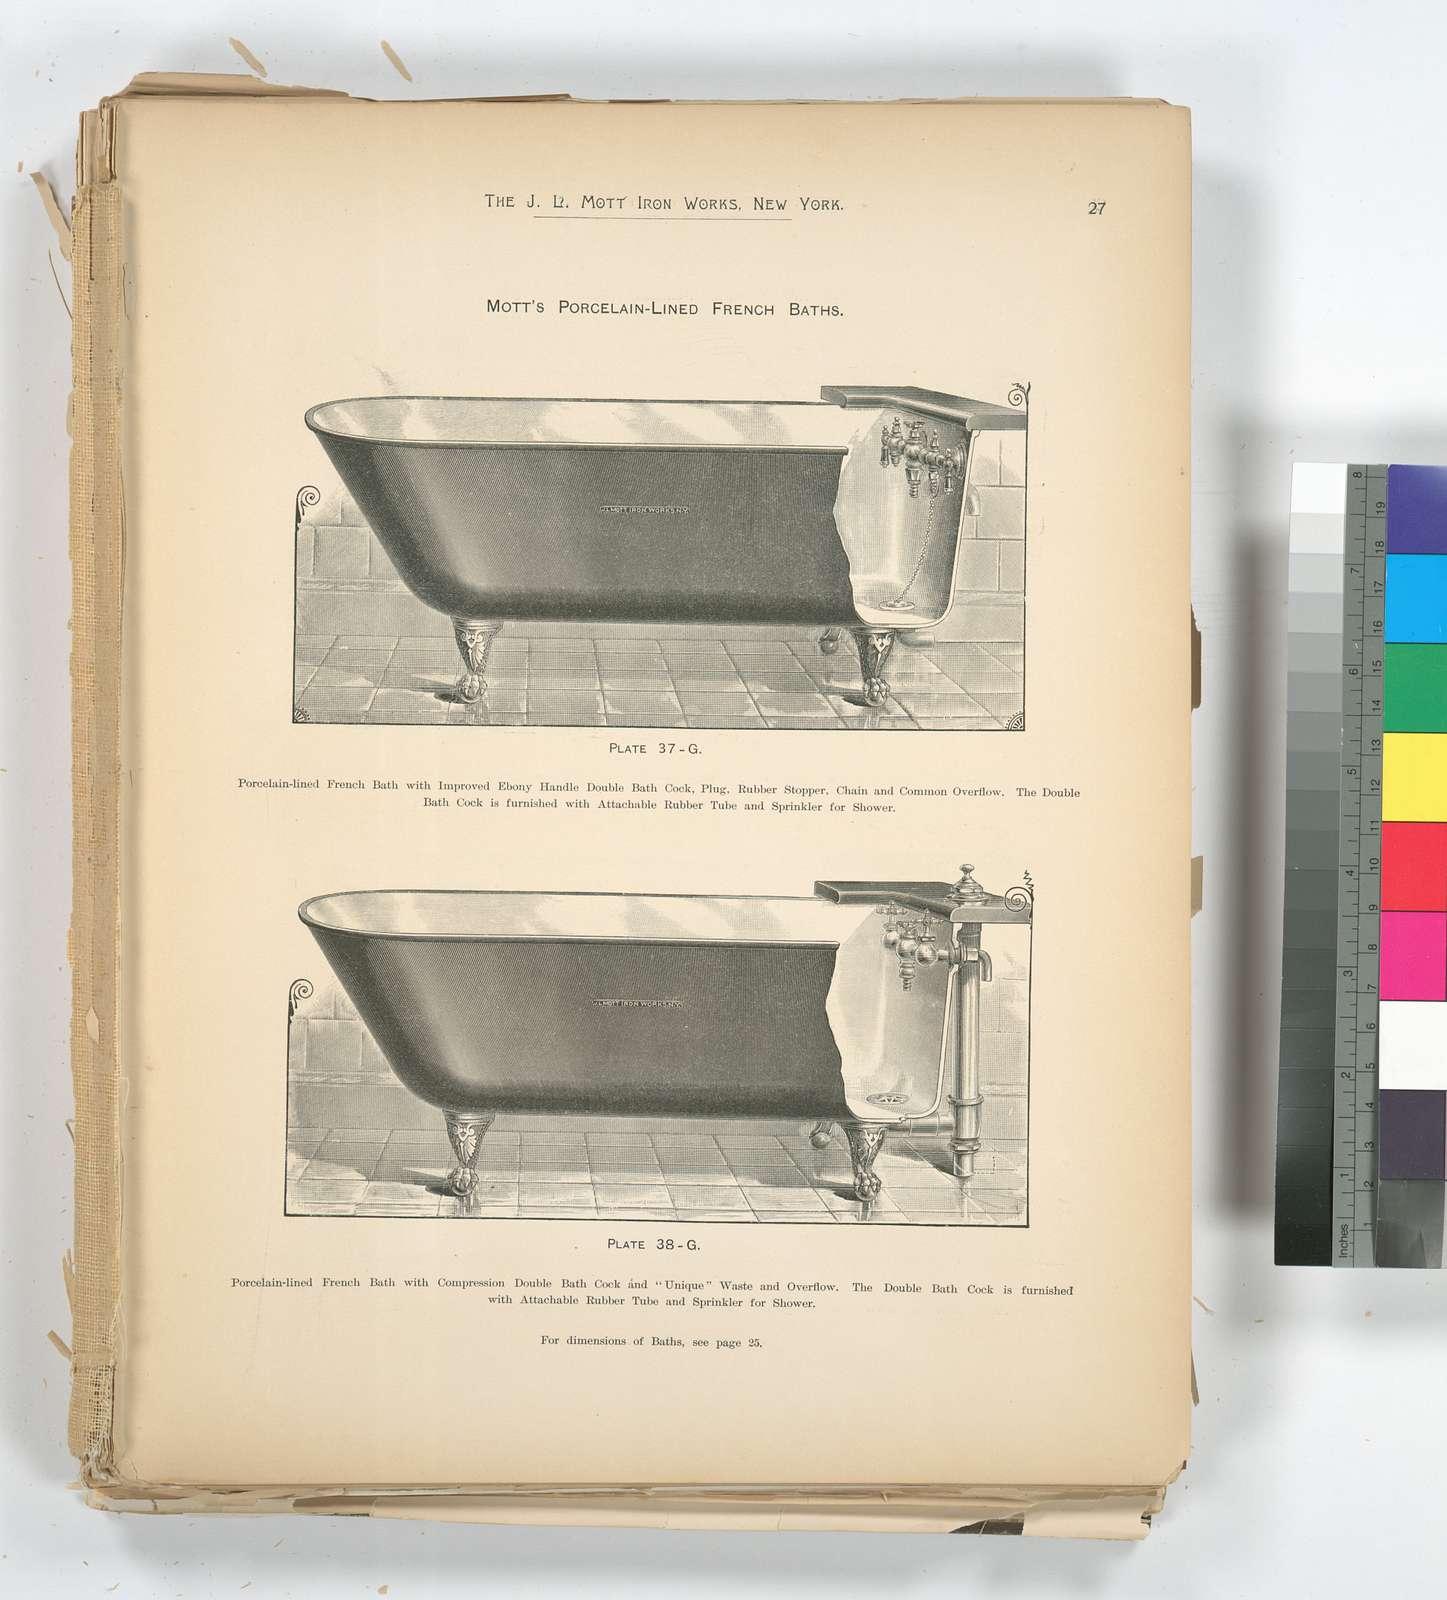 Mott's Porcelain-Lined French Baths.